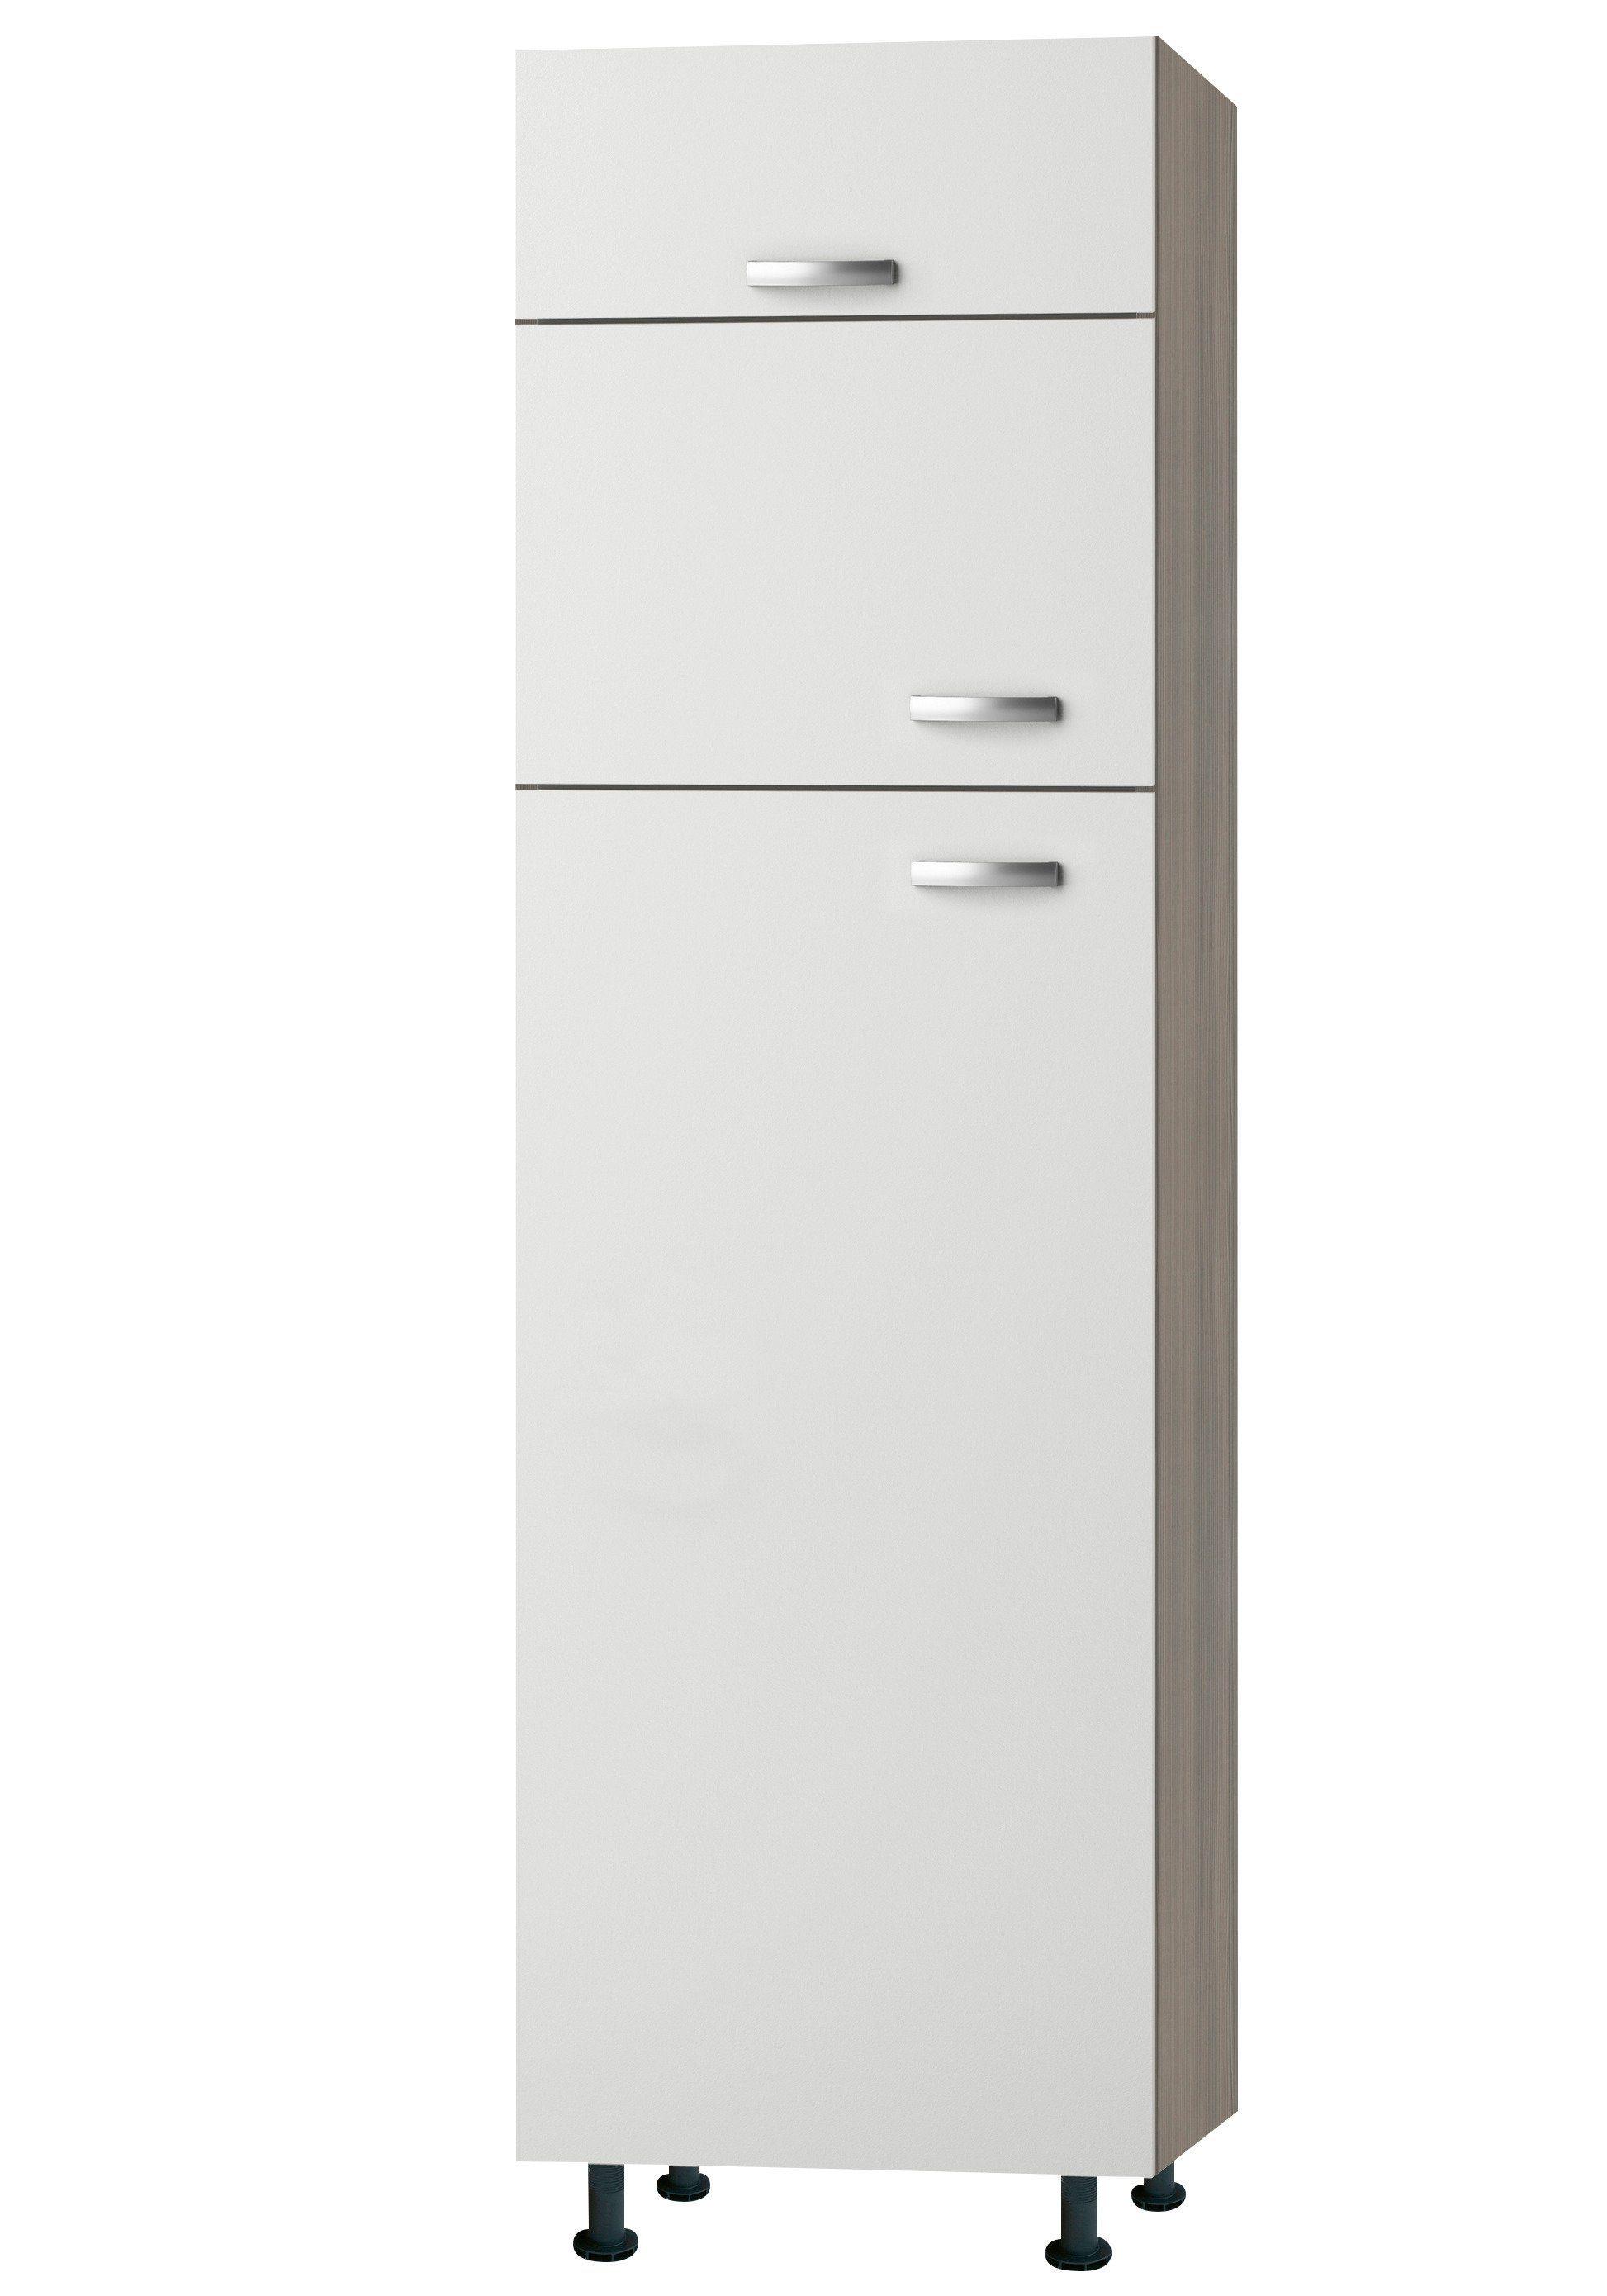 Kühl-Gefrierkombination »Torger, Höhe 211,8 cm«